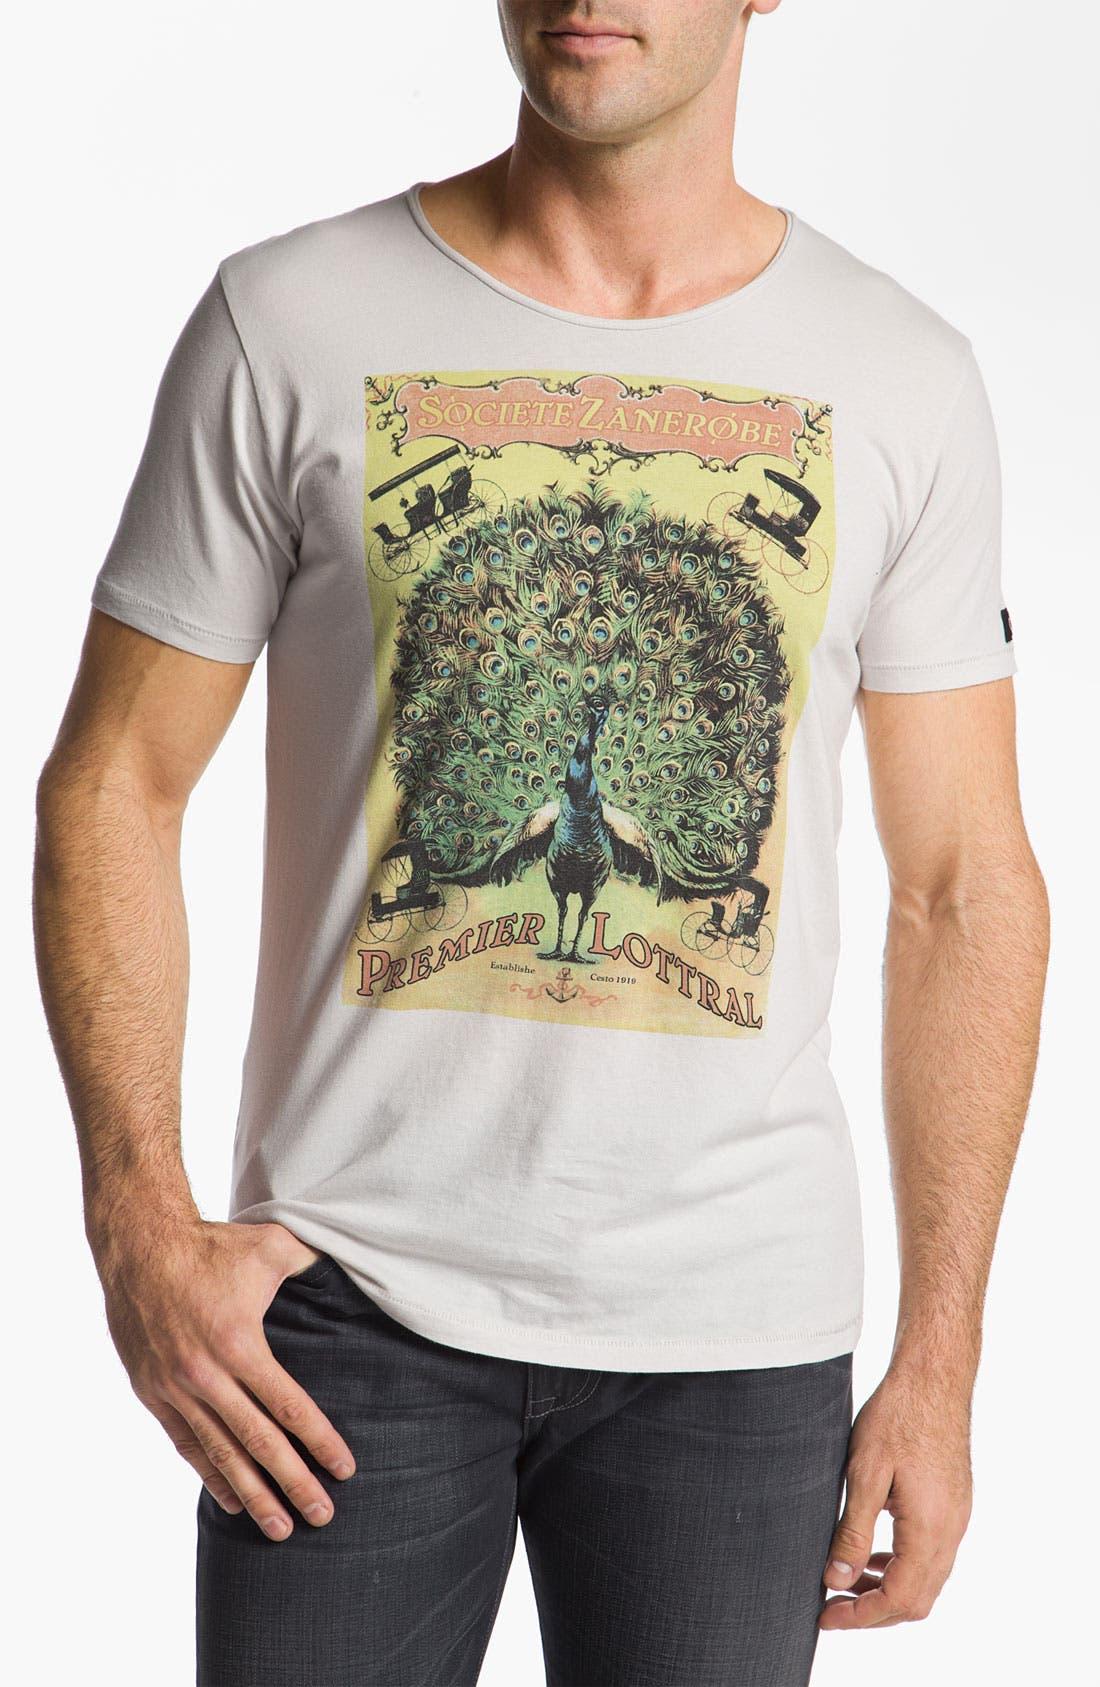 Alternate Image 1 Selected - Zanerobe 'Societe' T-Shirt